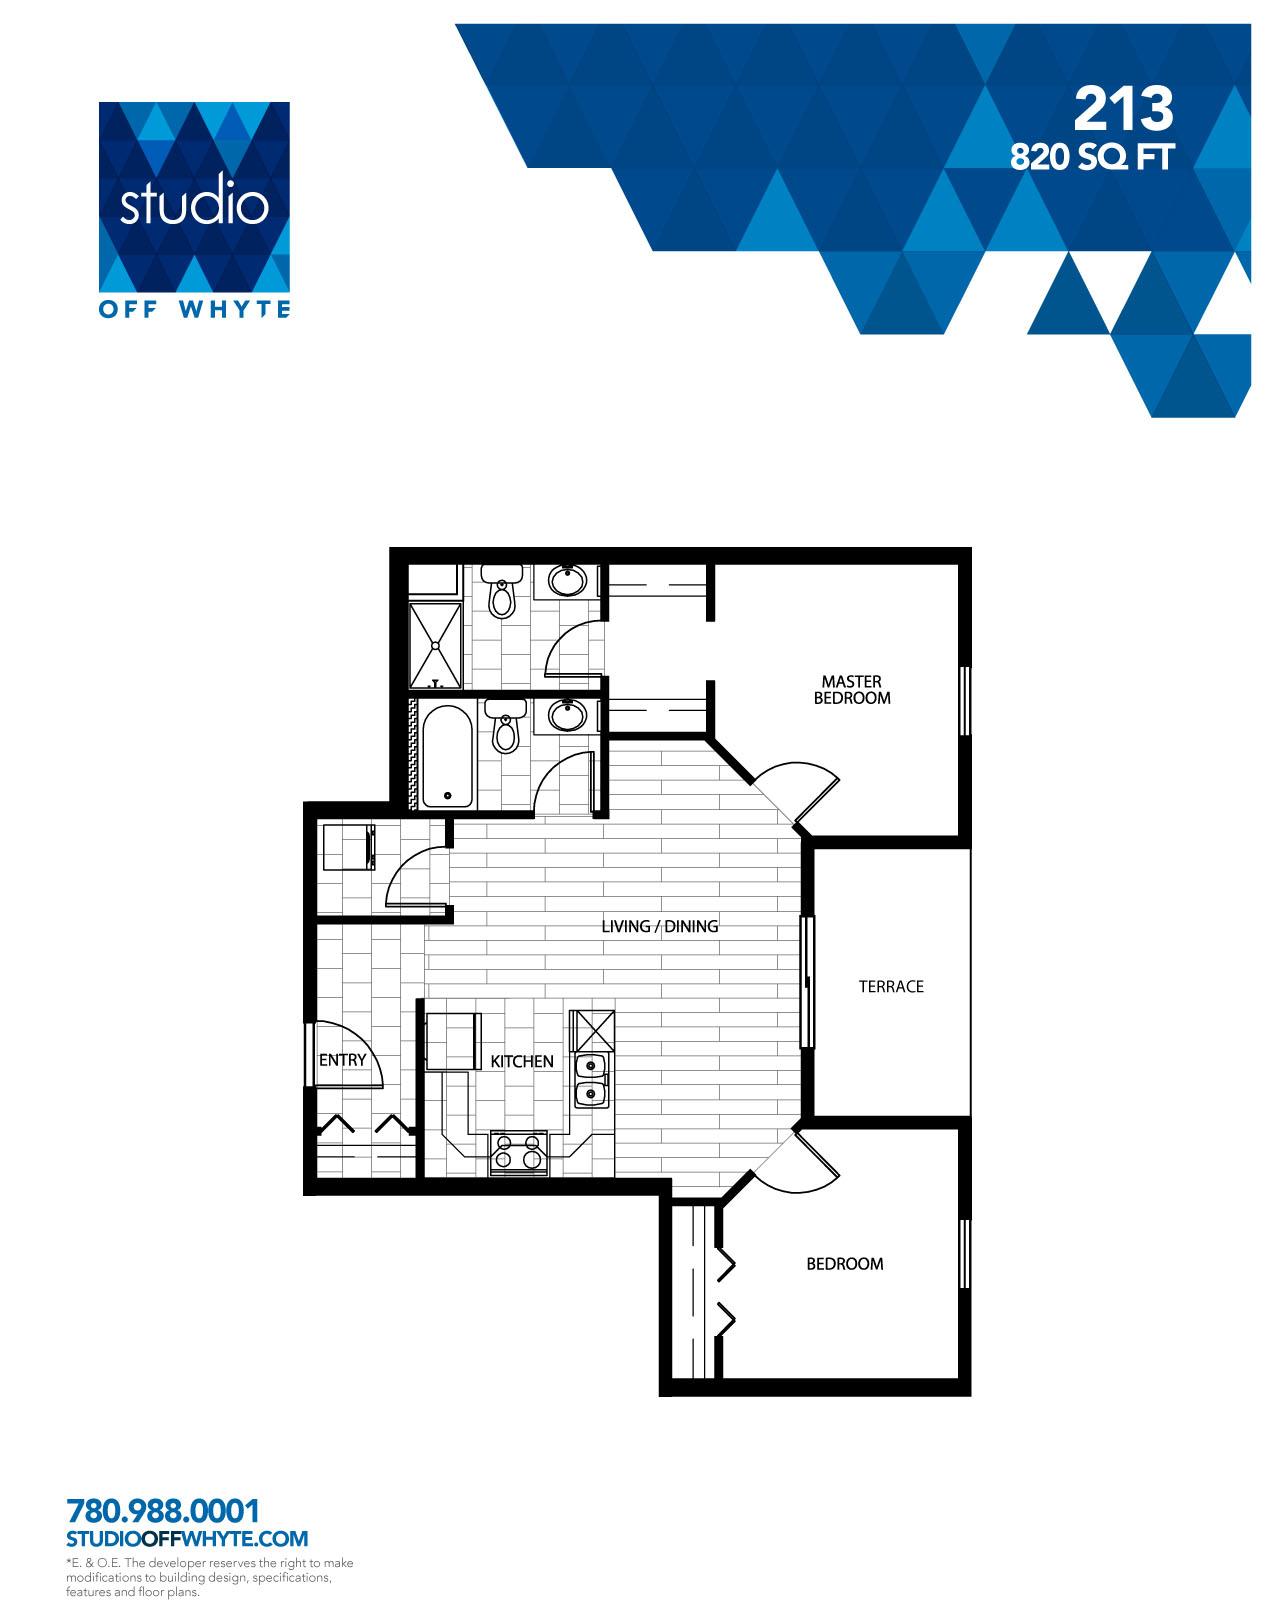 SOW Condo Floorplan